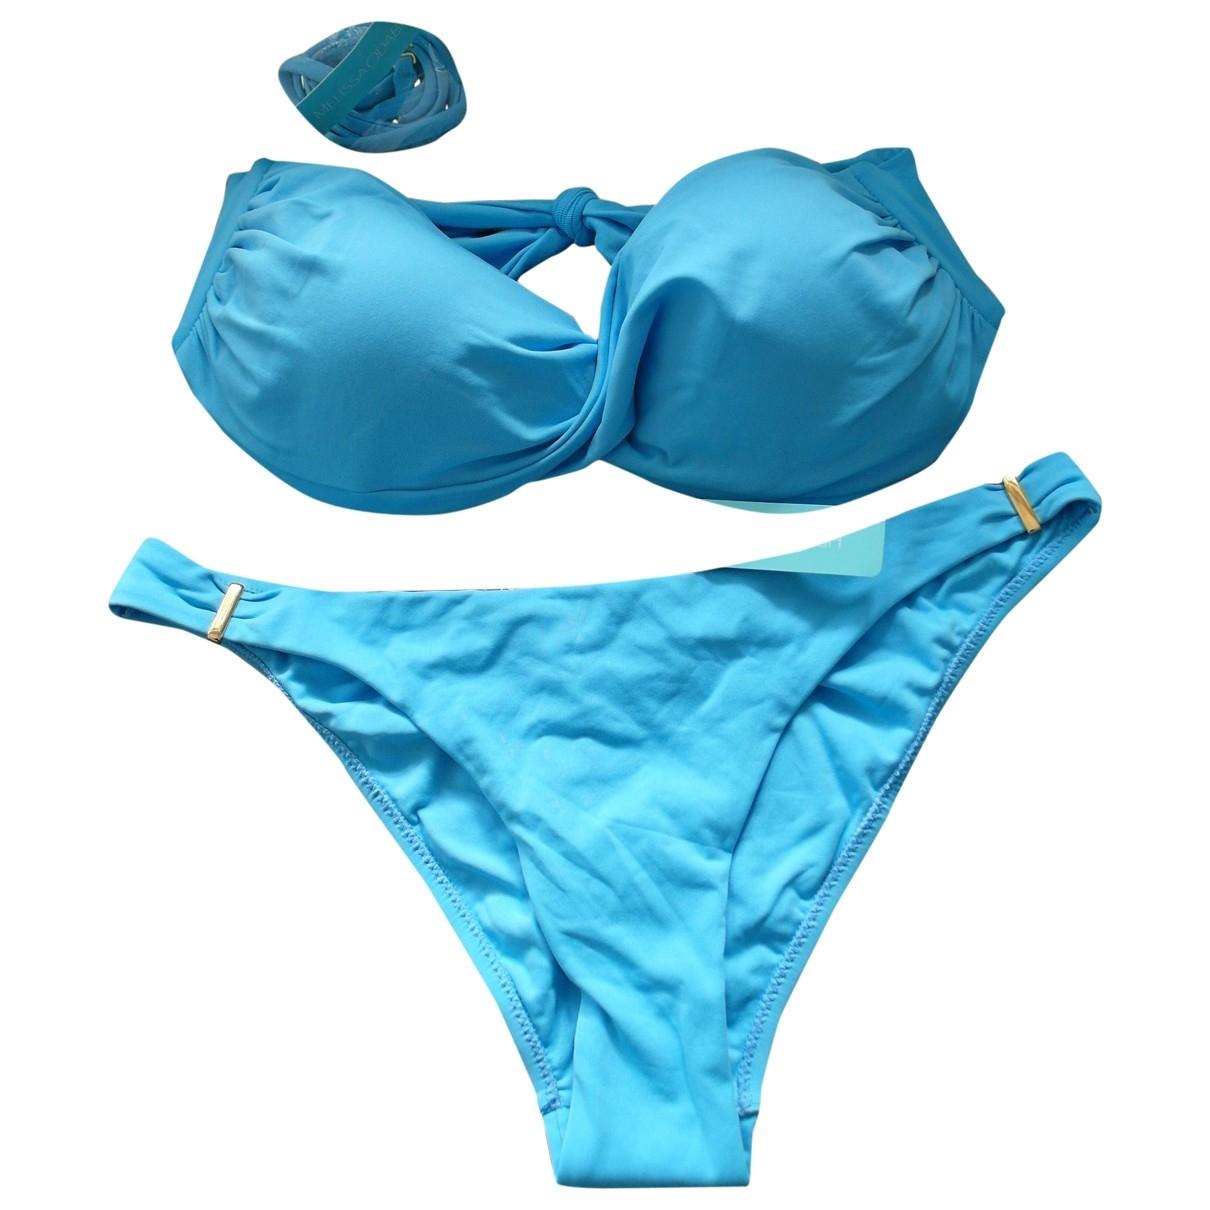 Melissa Odabash \N Turquoise Swimwear for Women 46 IT